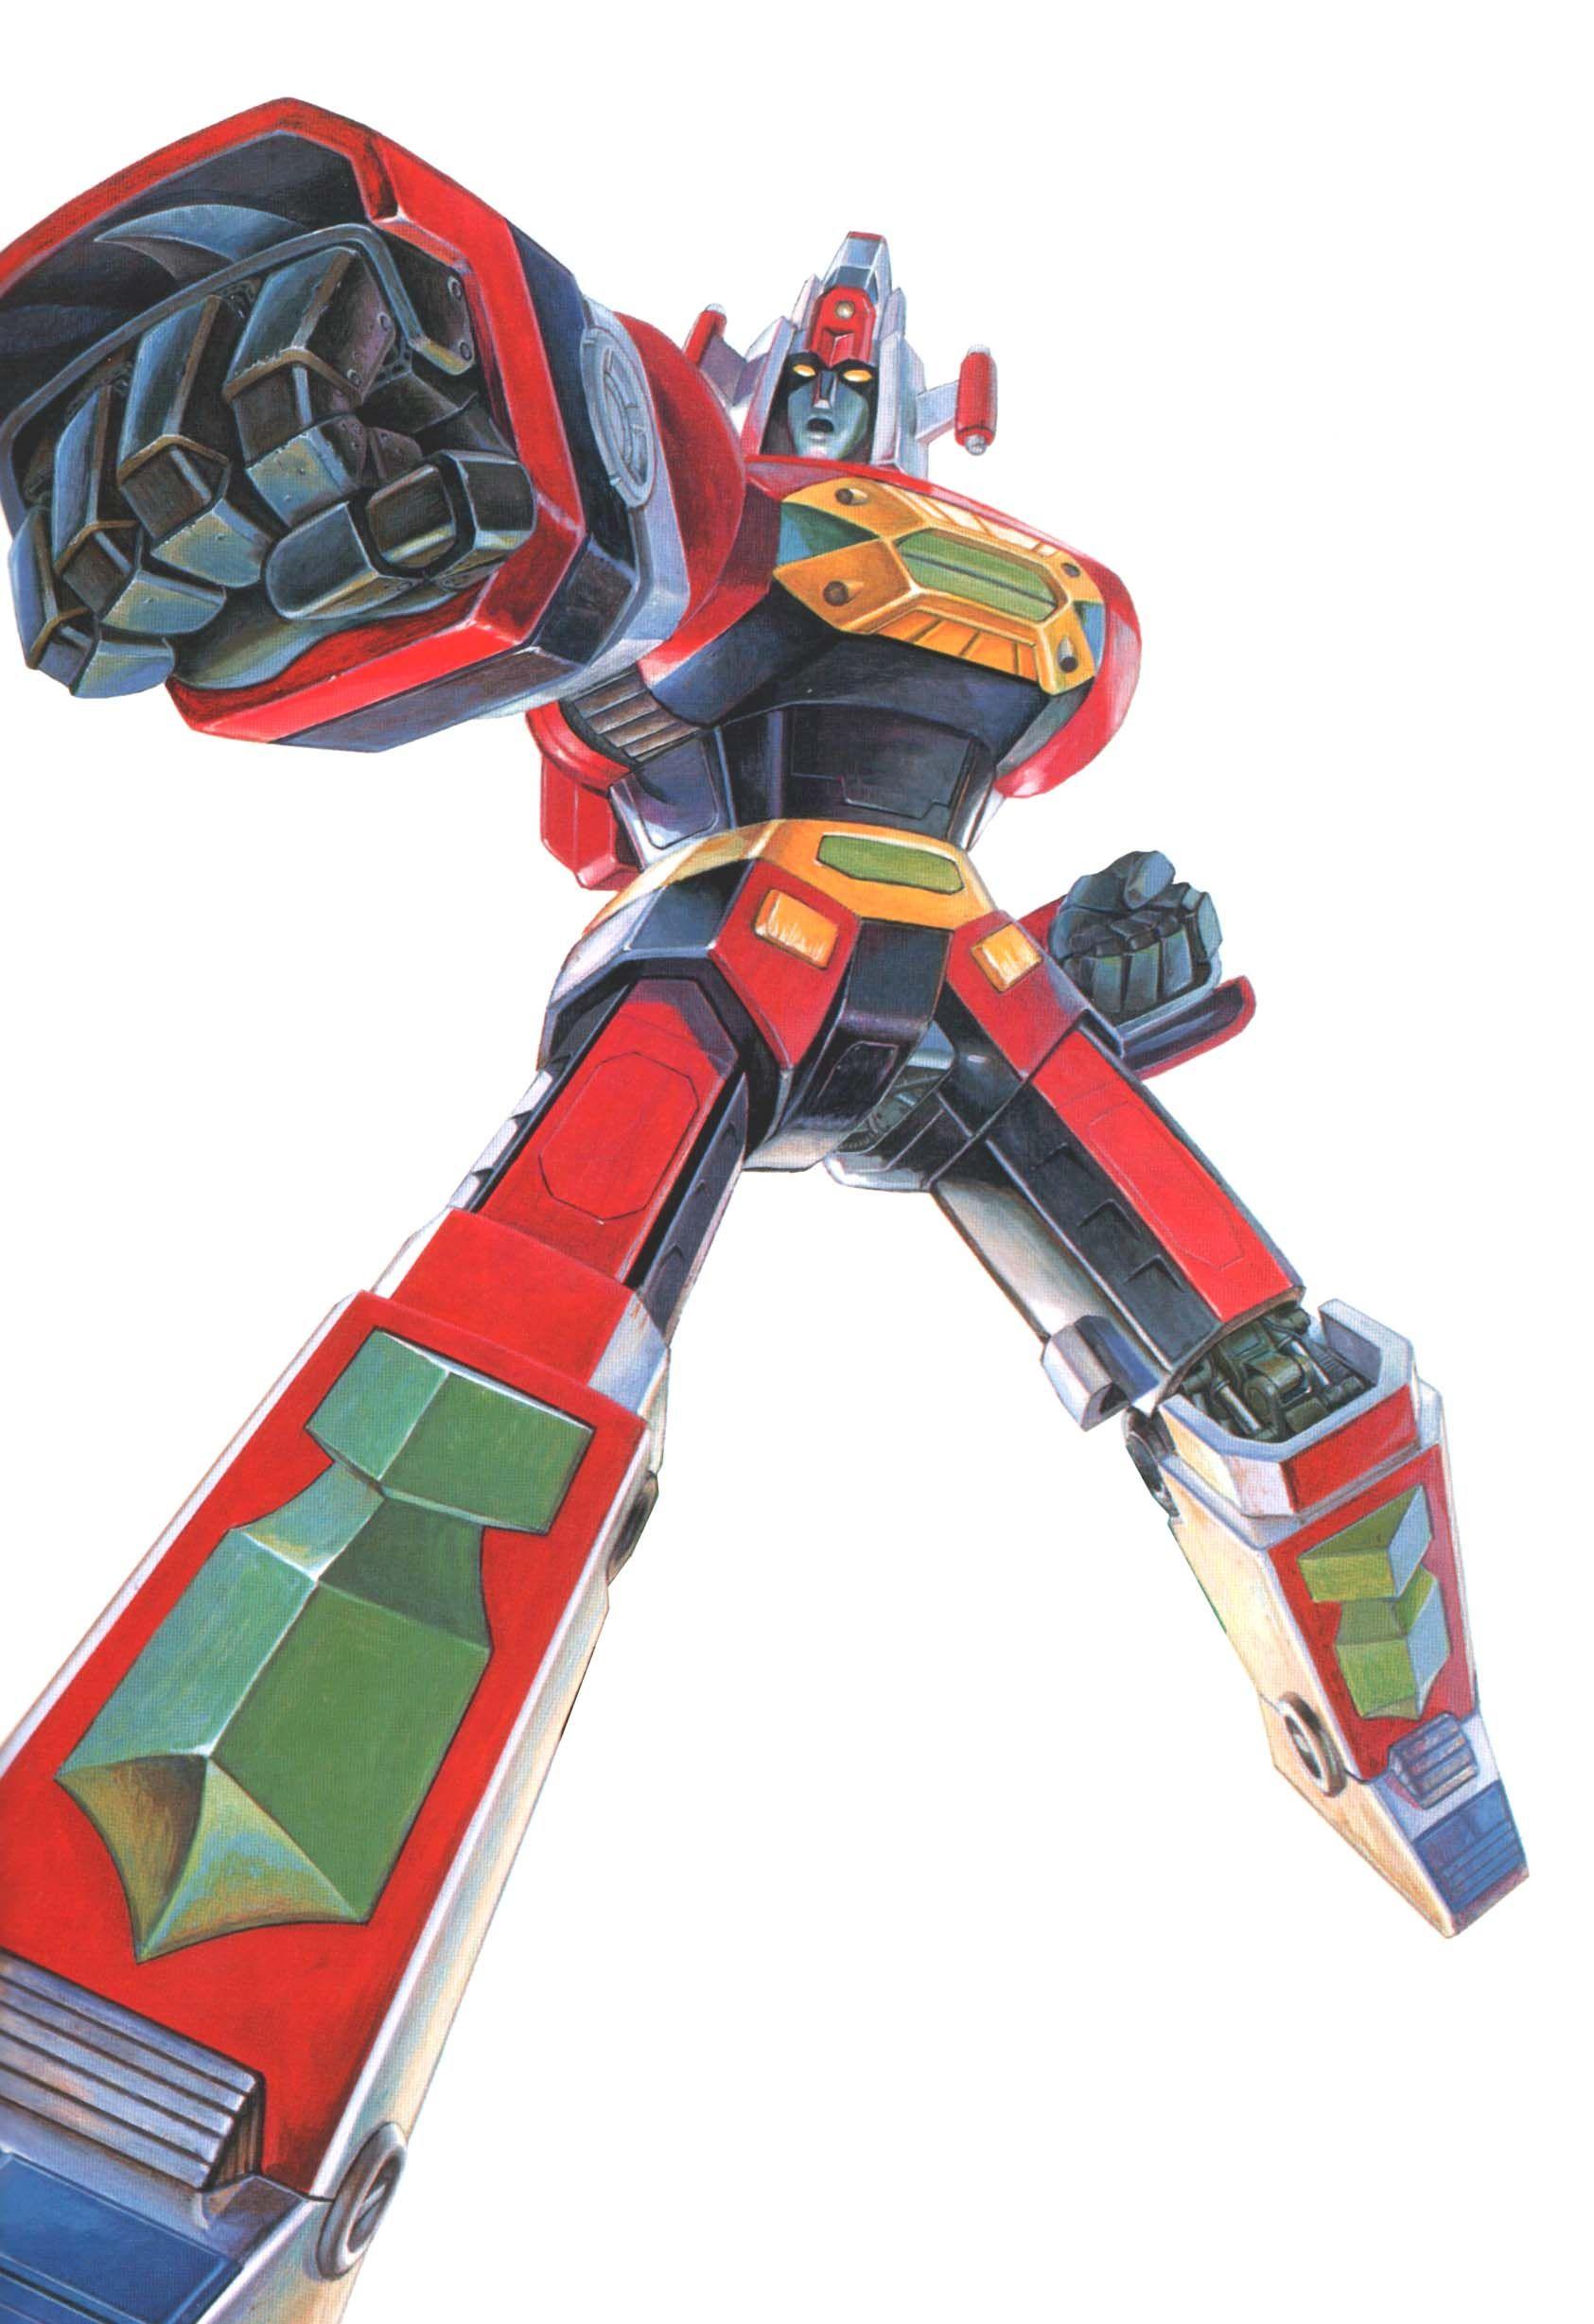 Shogun Warrior Daimos Mecha Pinterest Robot, Super